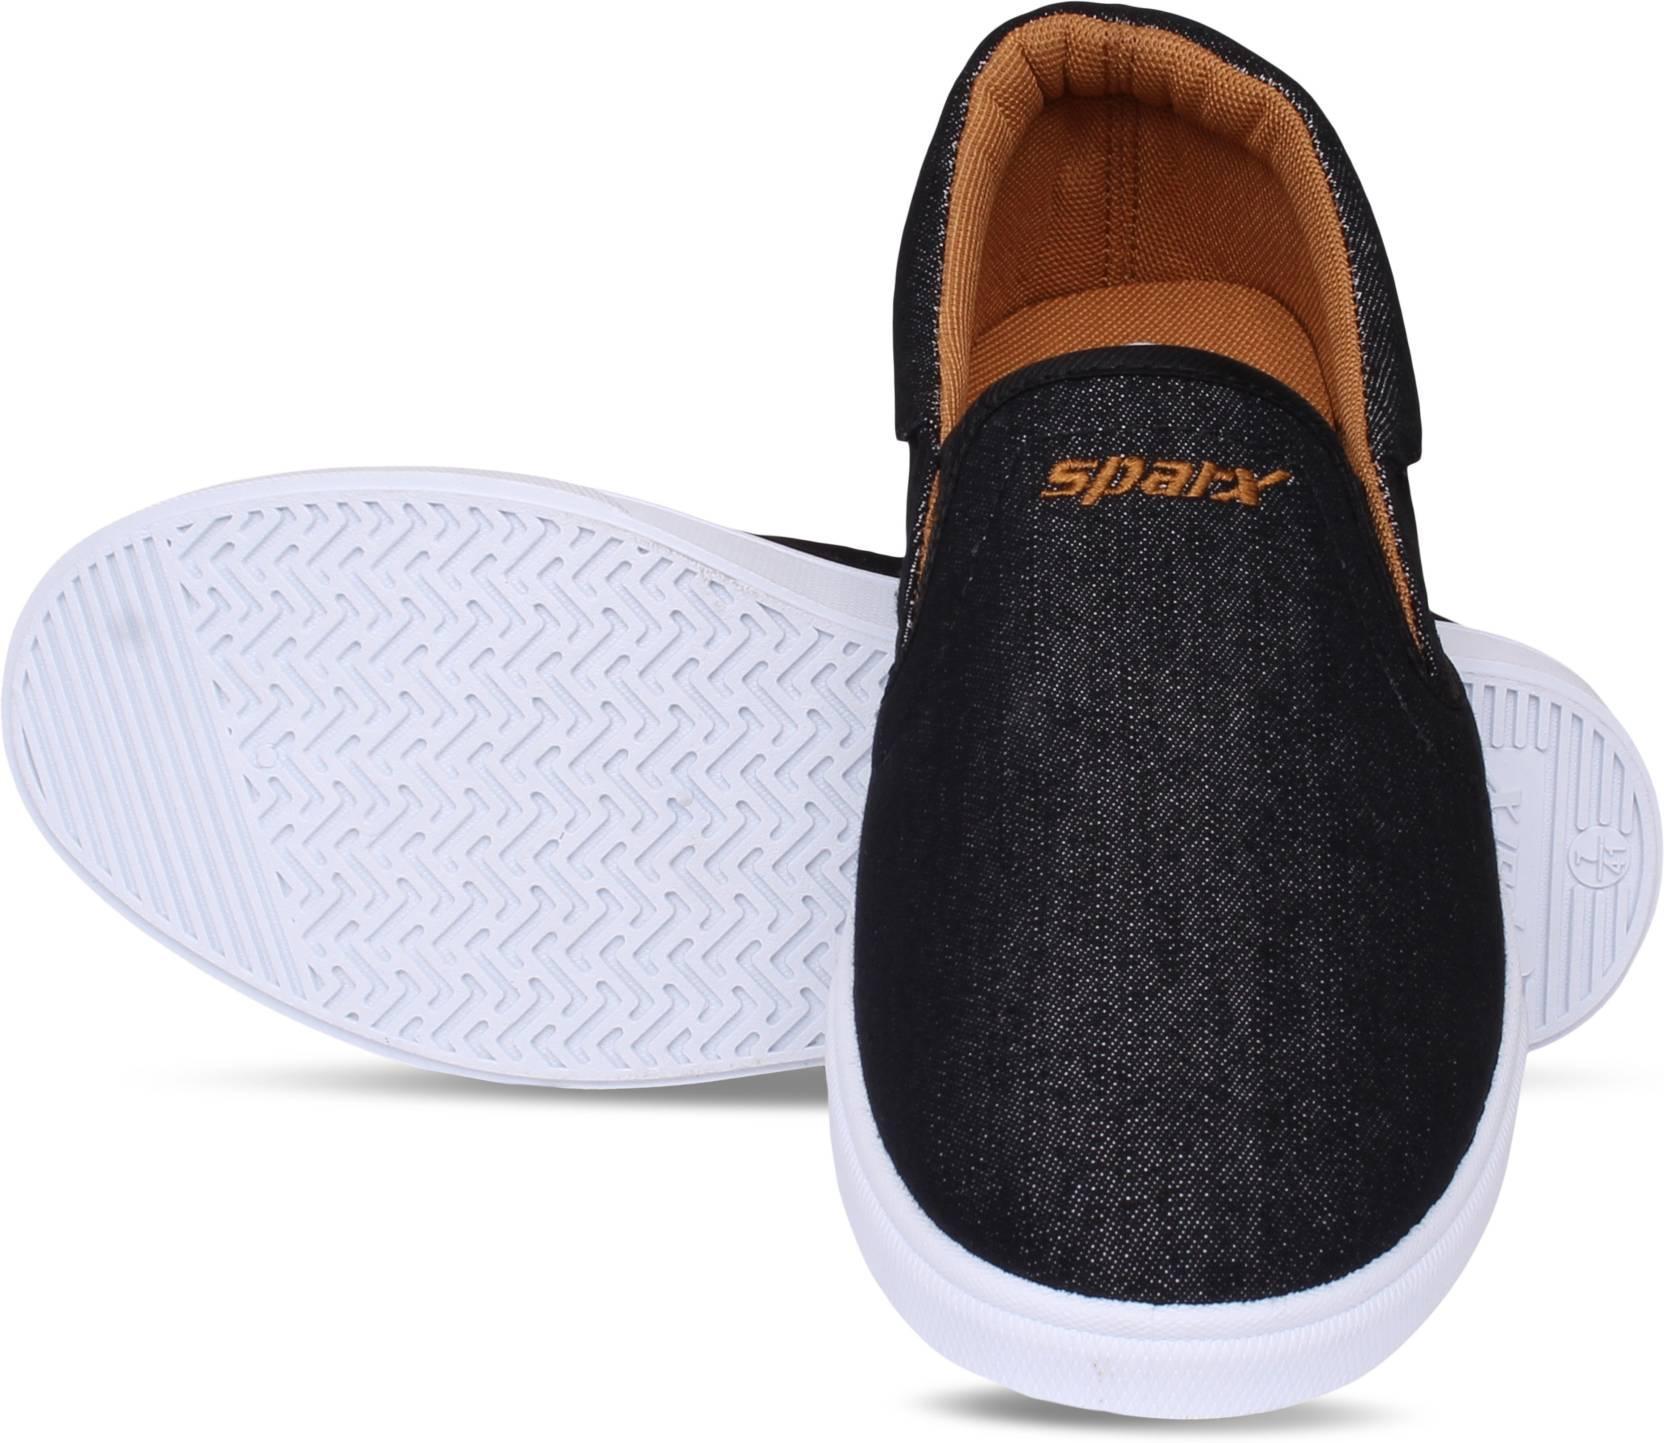 SparxMen SM-402 Black Slip On Sneakers For Men(Black)